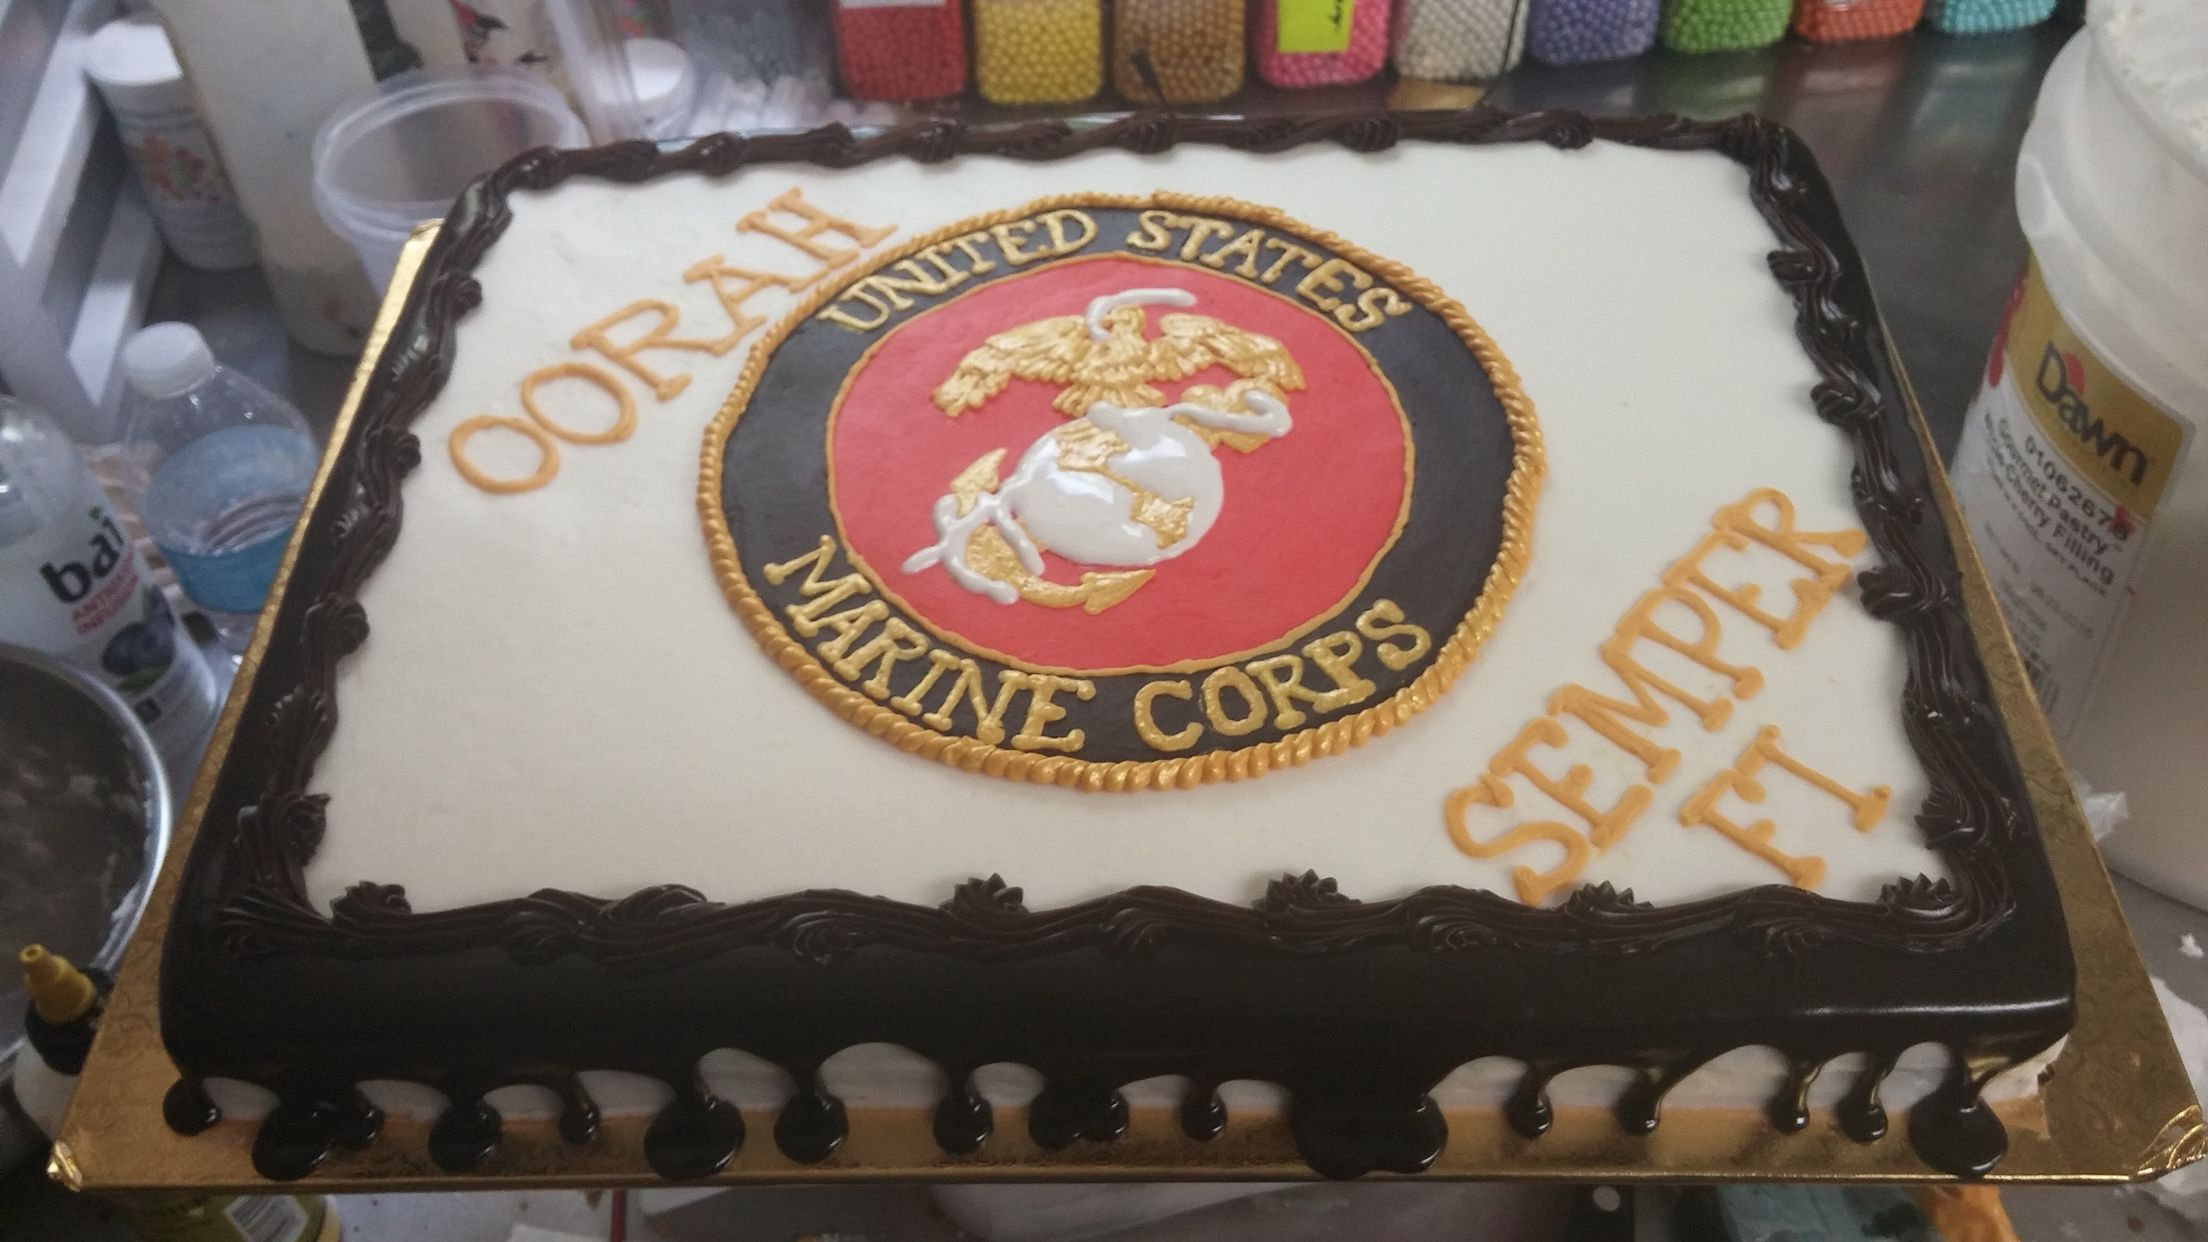 Marine Corps Cake from Naegelin's Bakery Marine cake